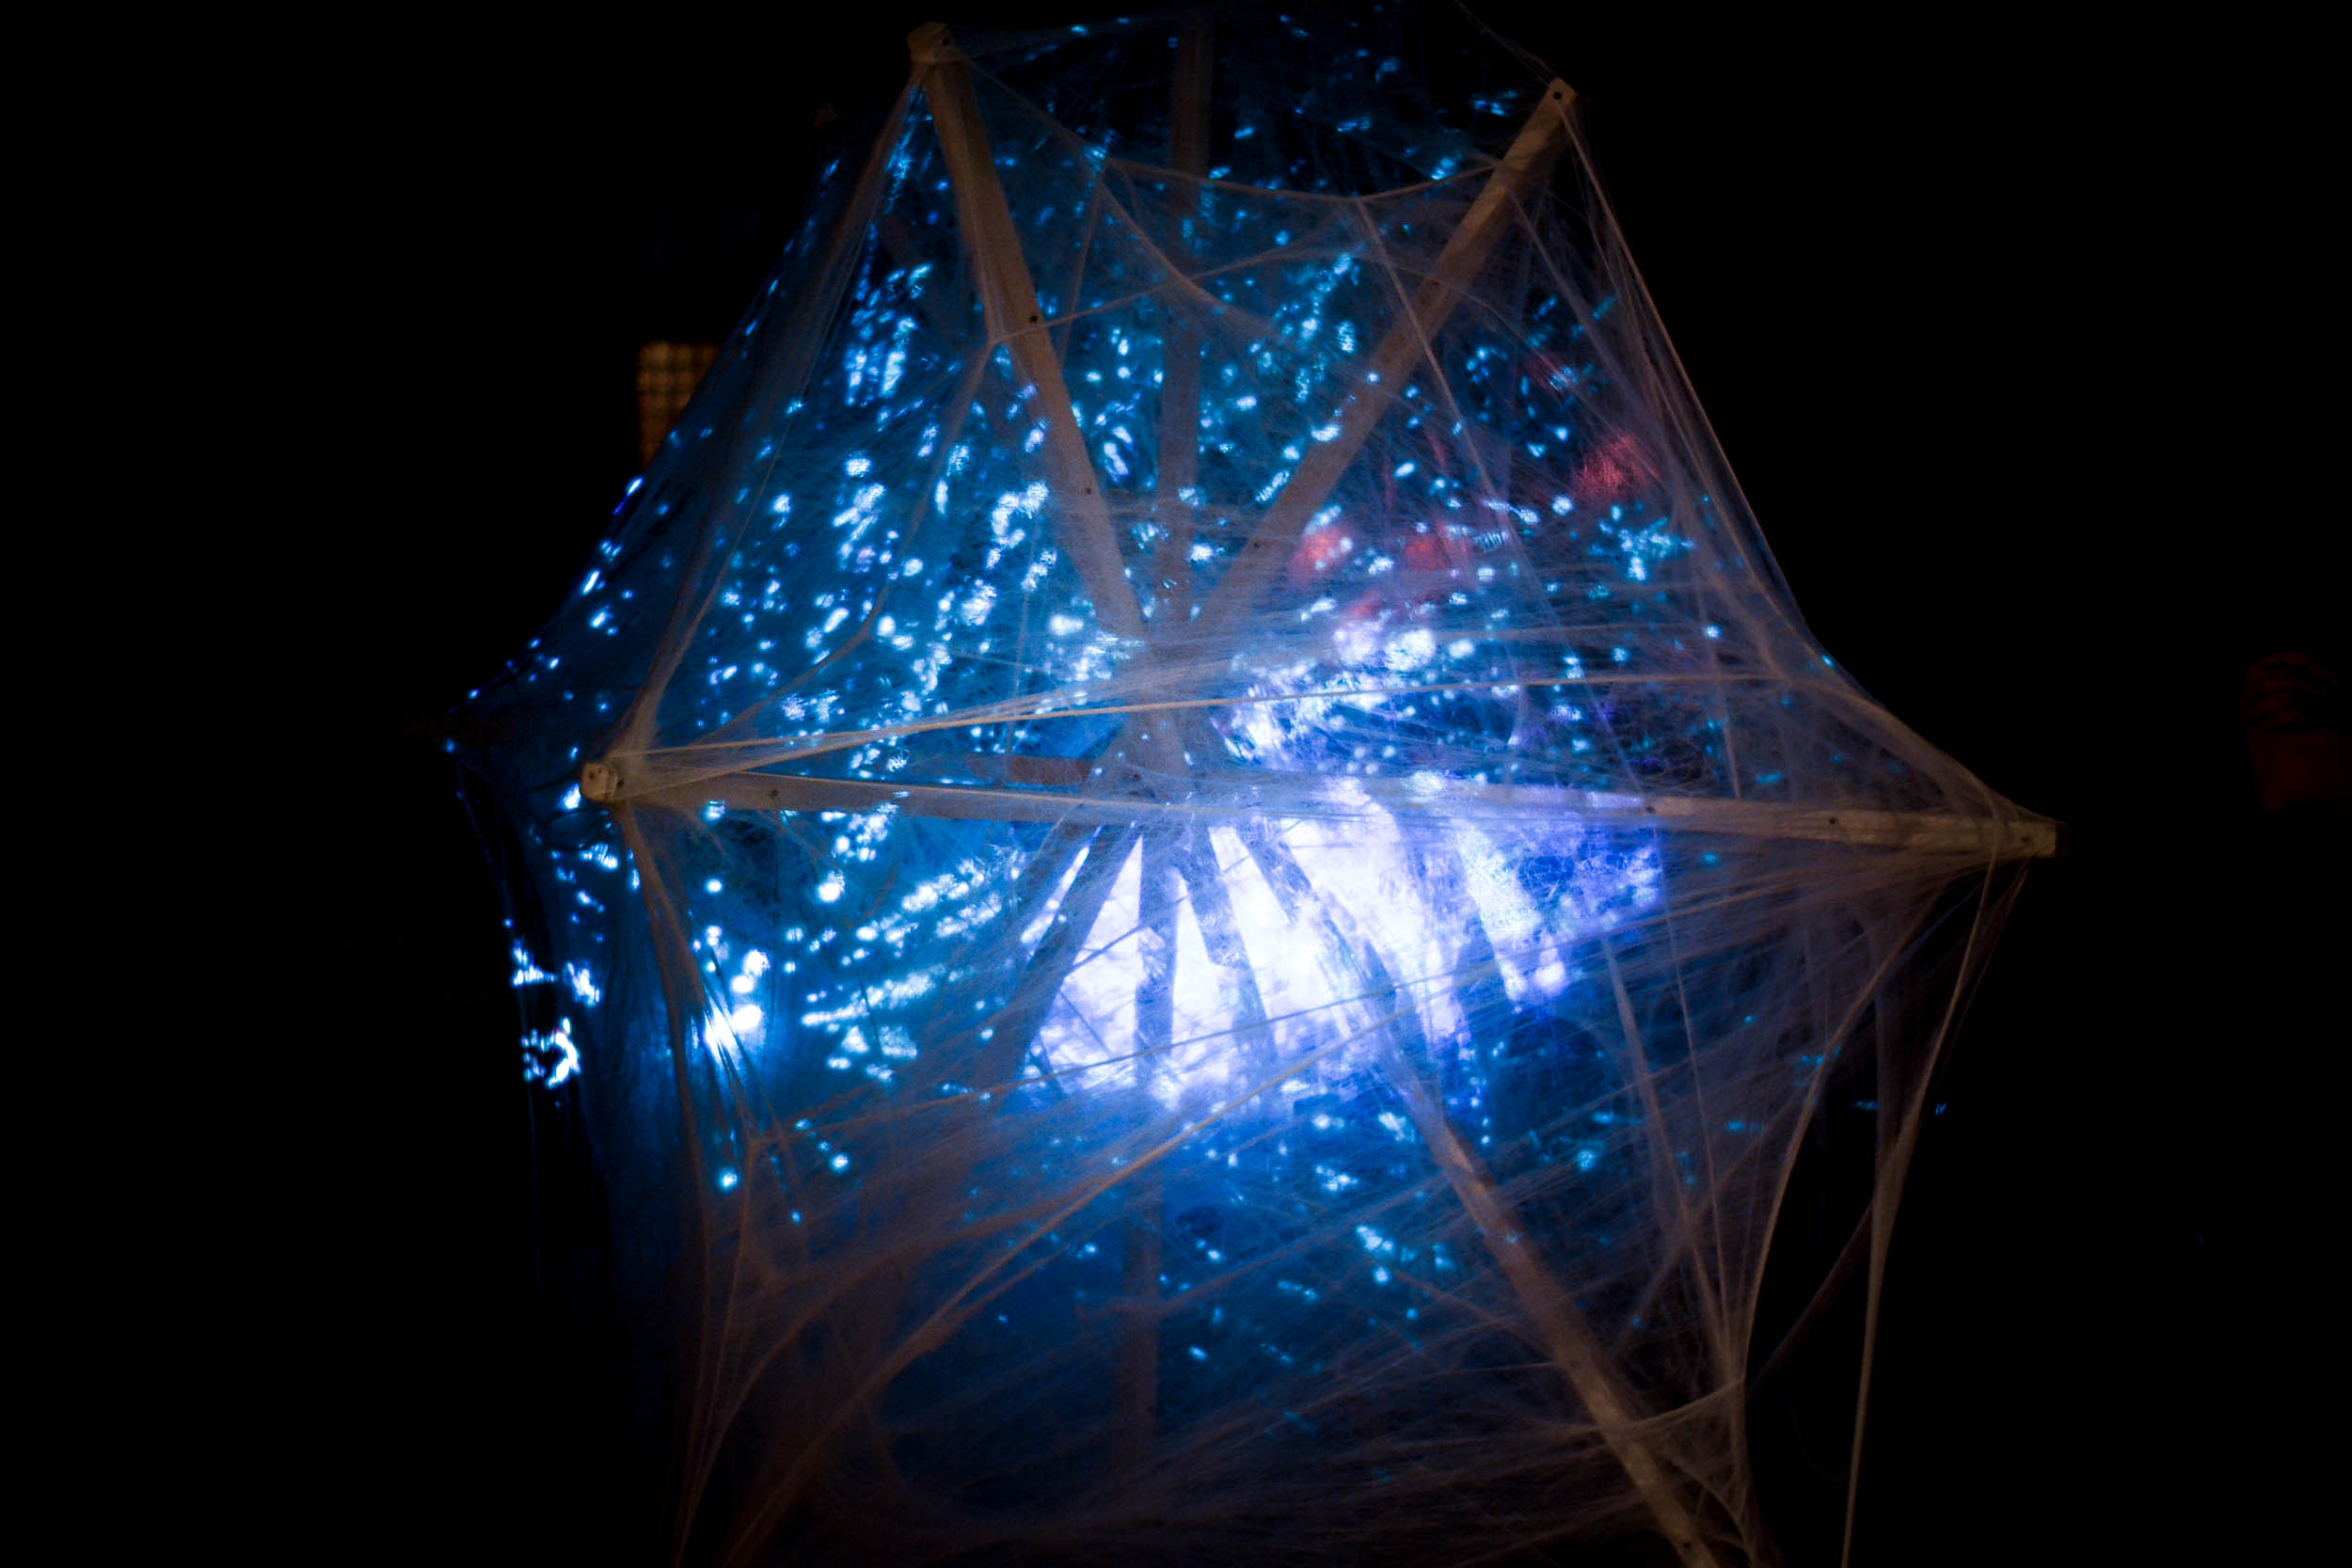 Nebula by Ninjacat at Art of Science 2013 0066.jpg